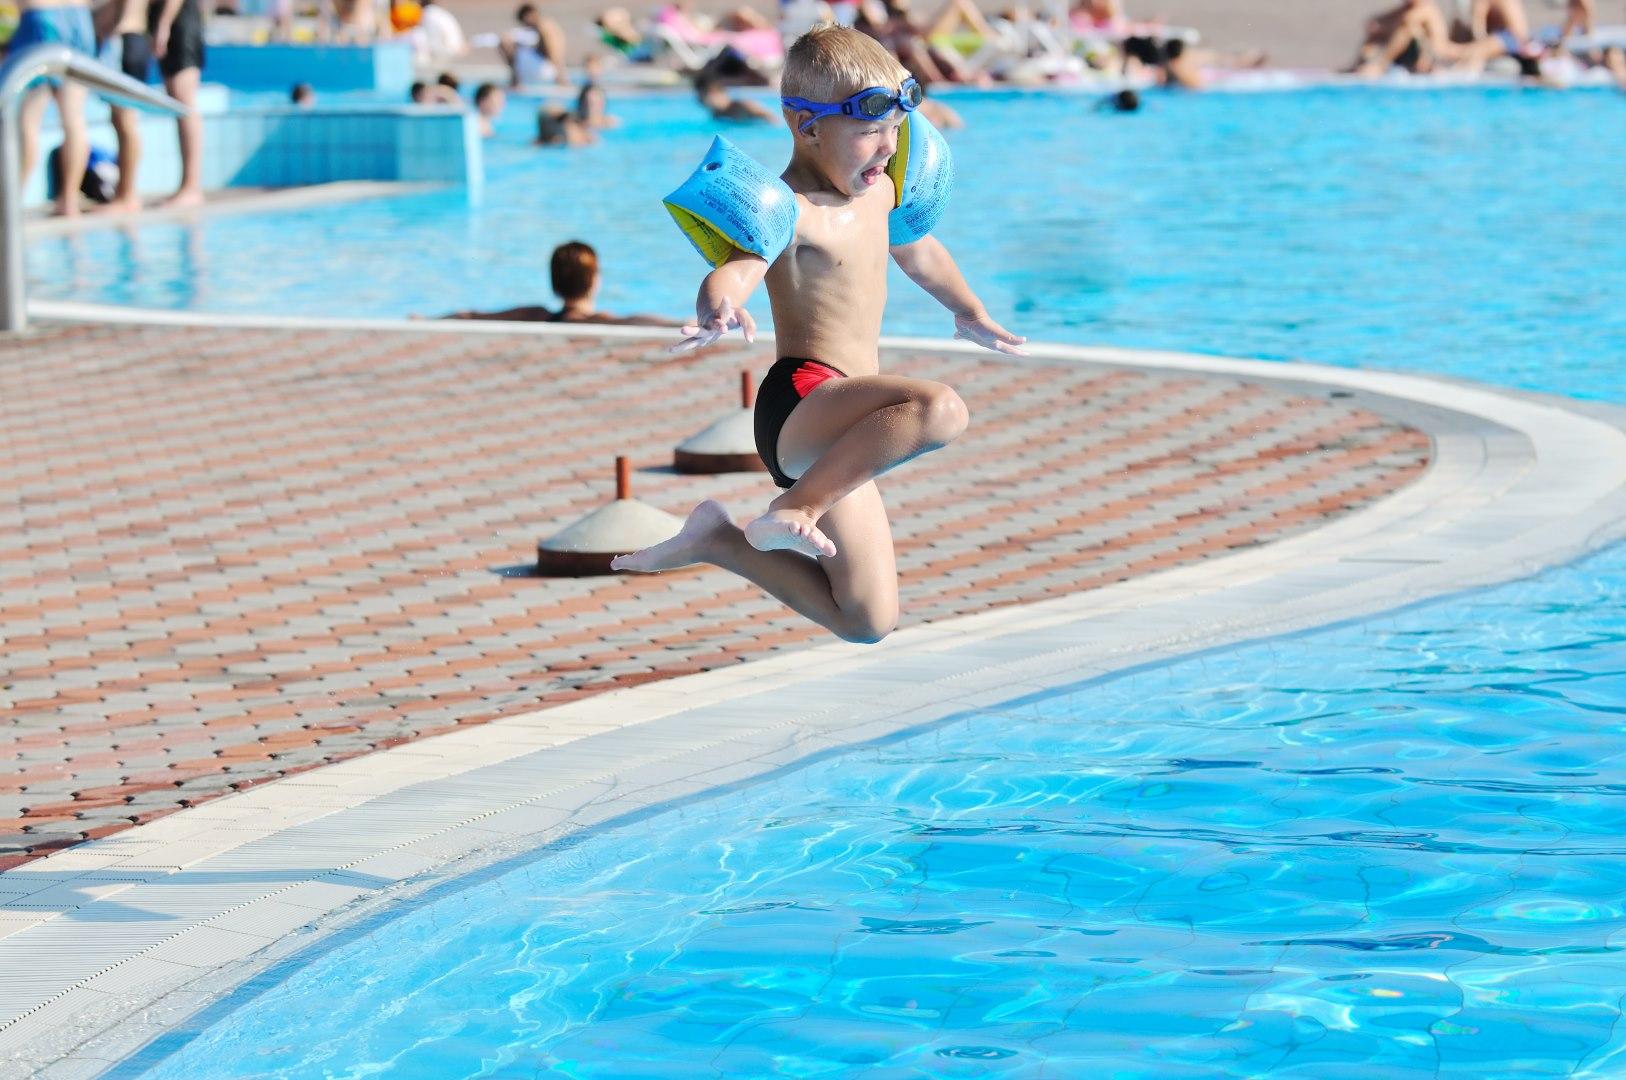 Finition piscine creus e resocoat for Camping a quebec avec piscine